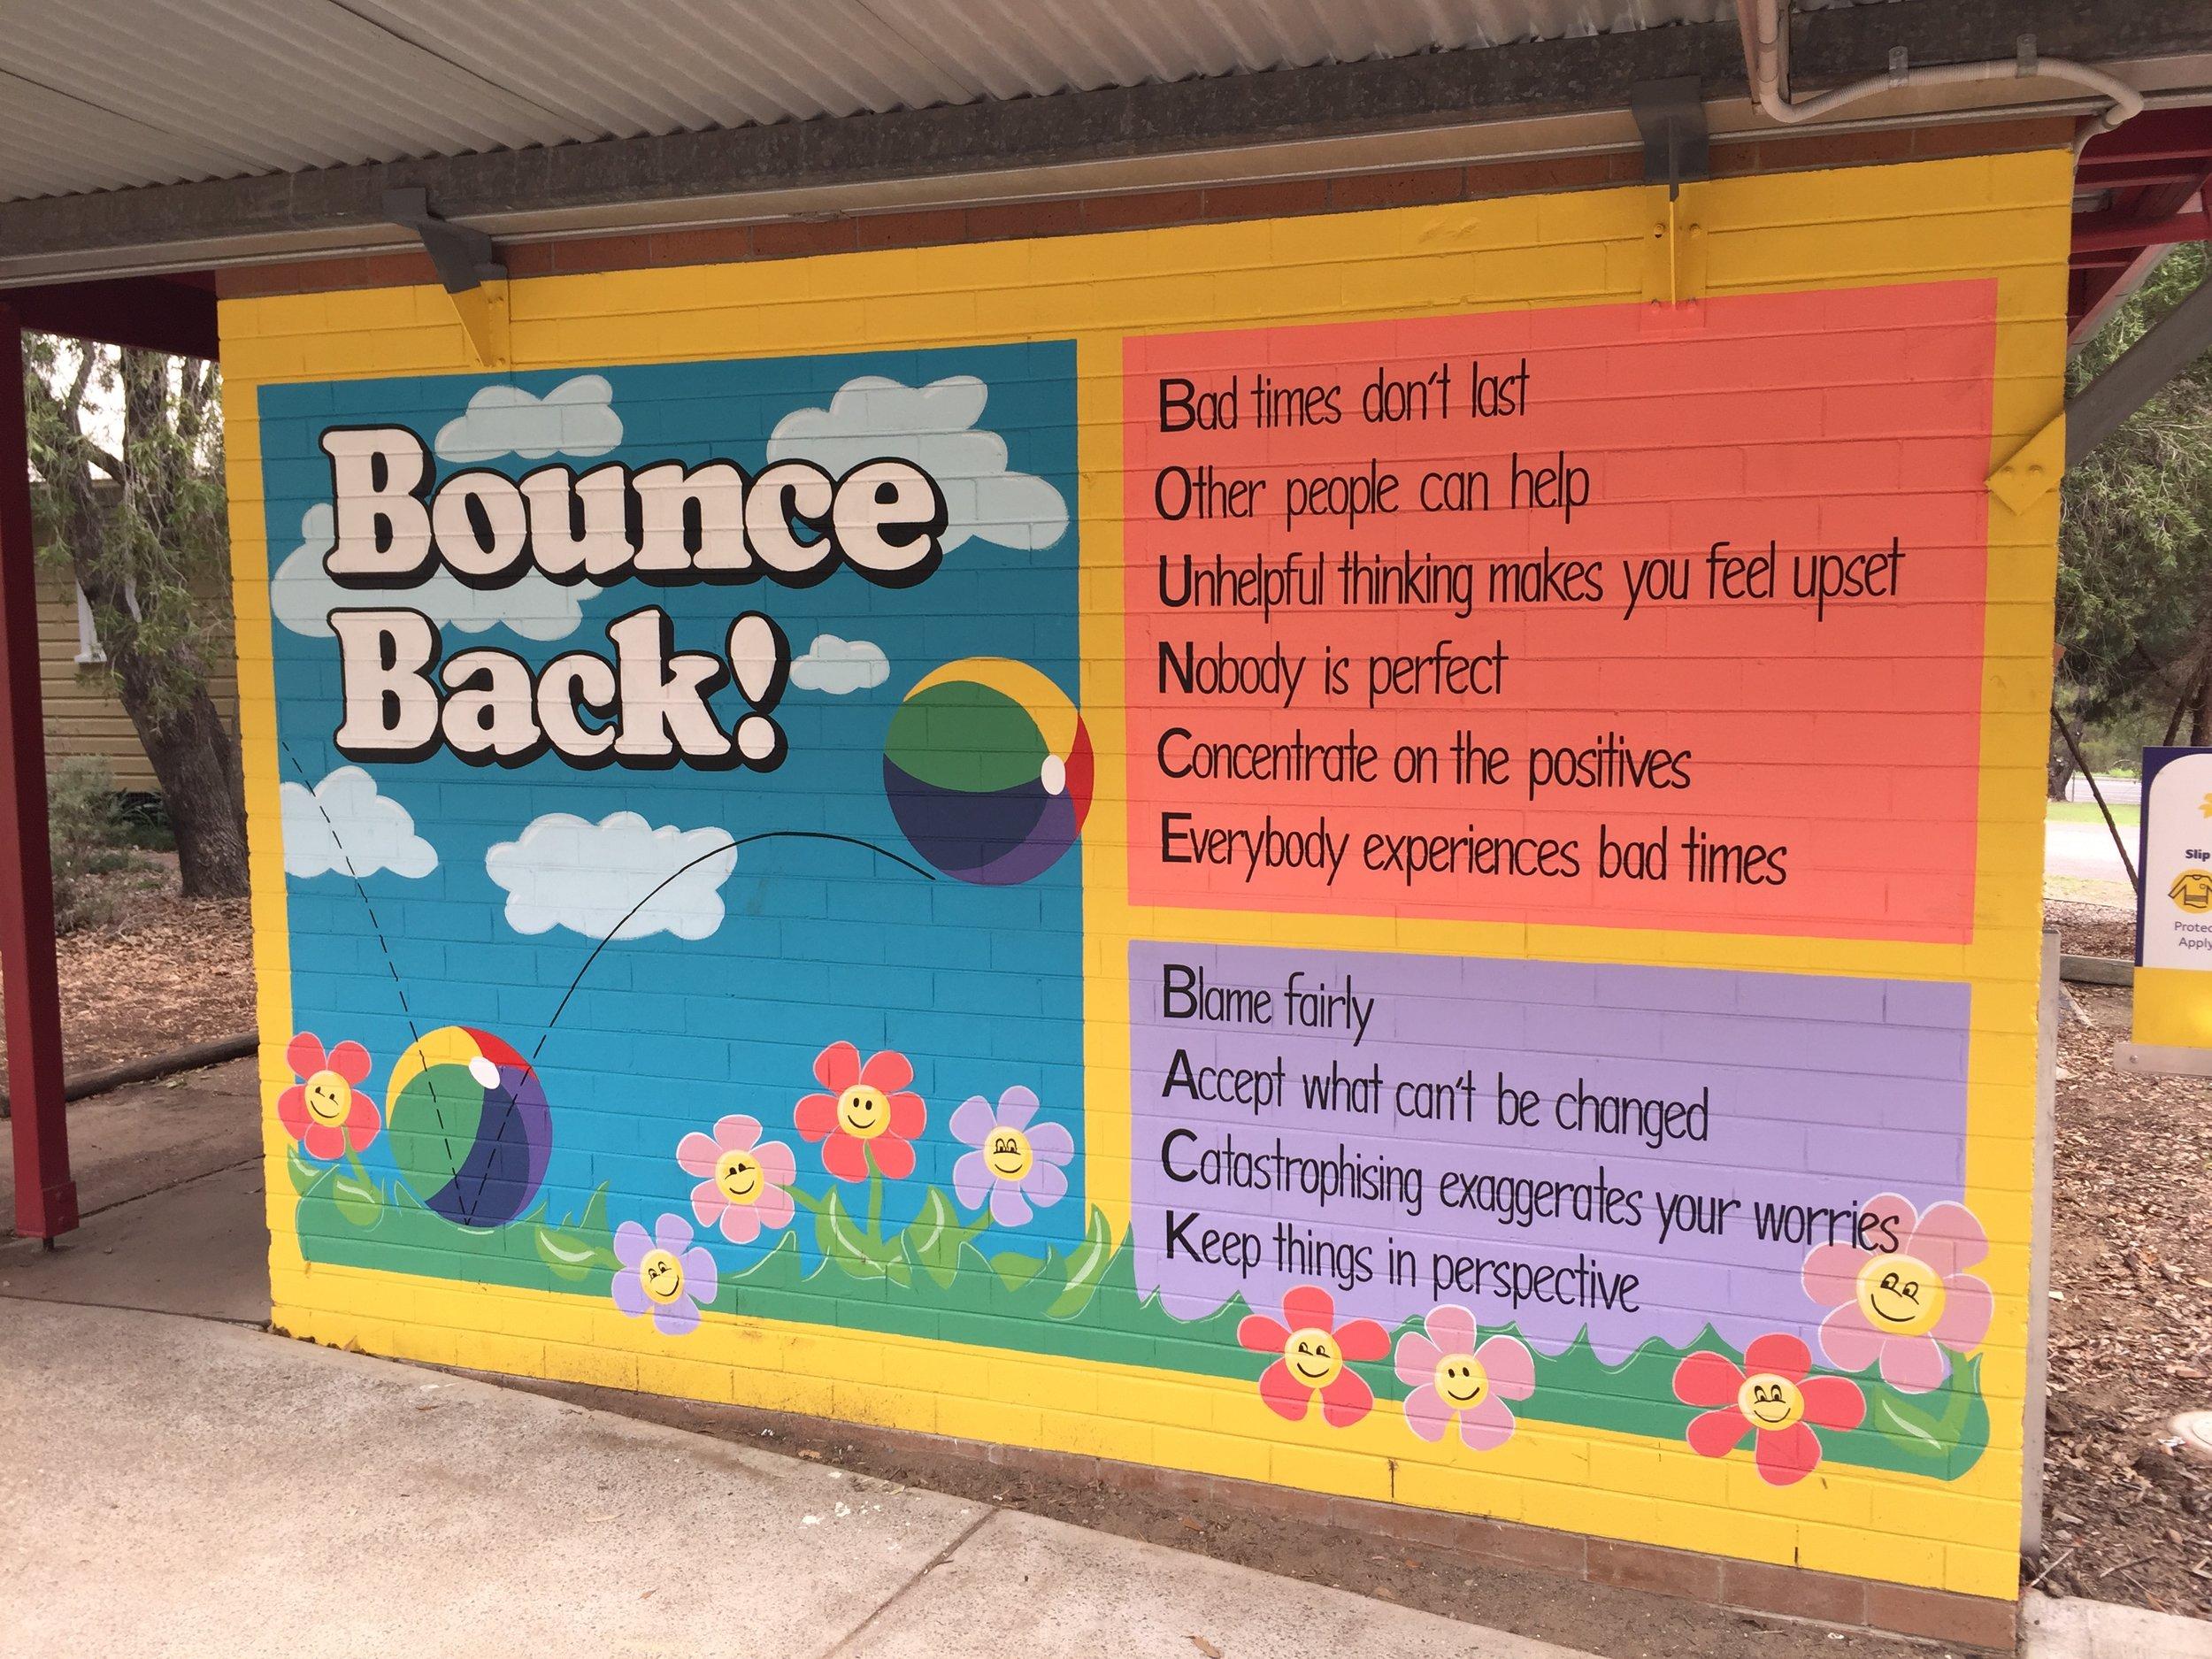 Bounce Back! at Ellalong Public School, NSW. Artist: Merryn McDonald.